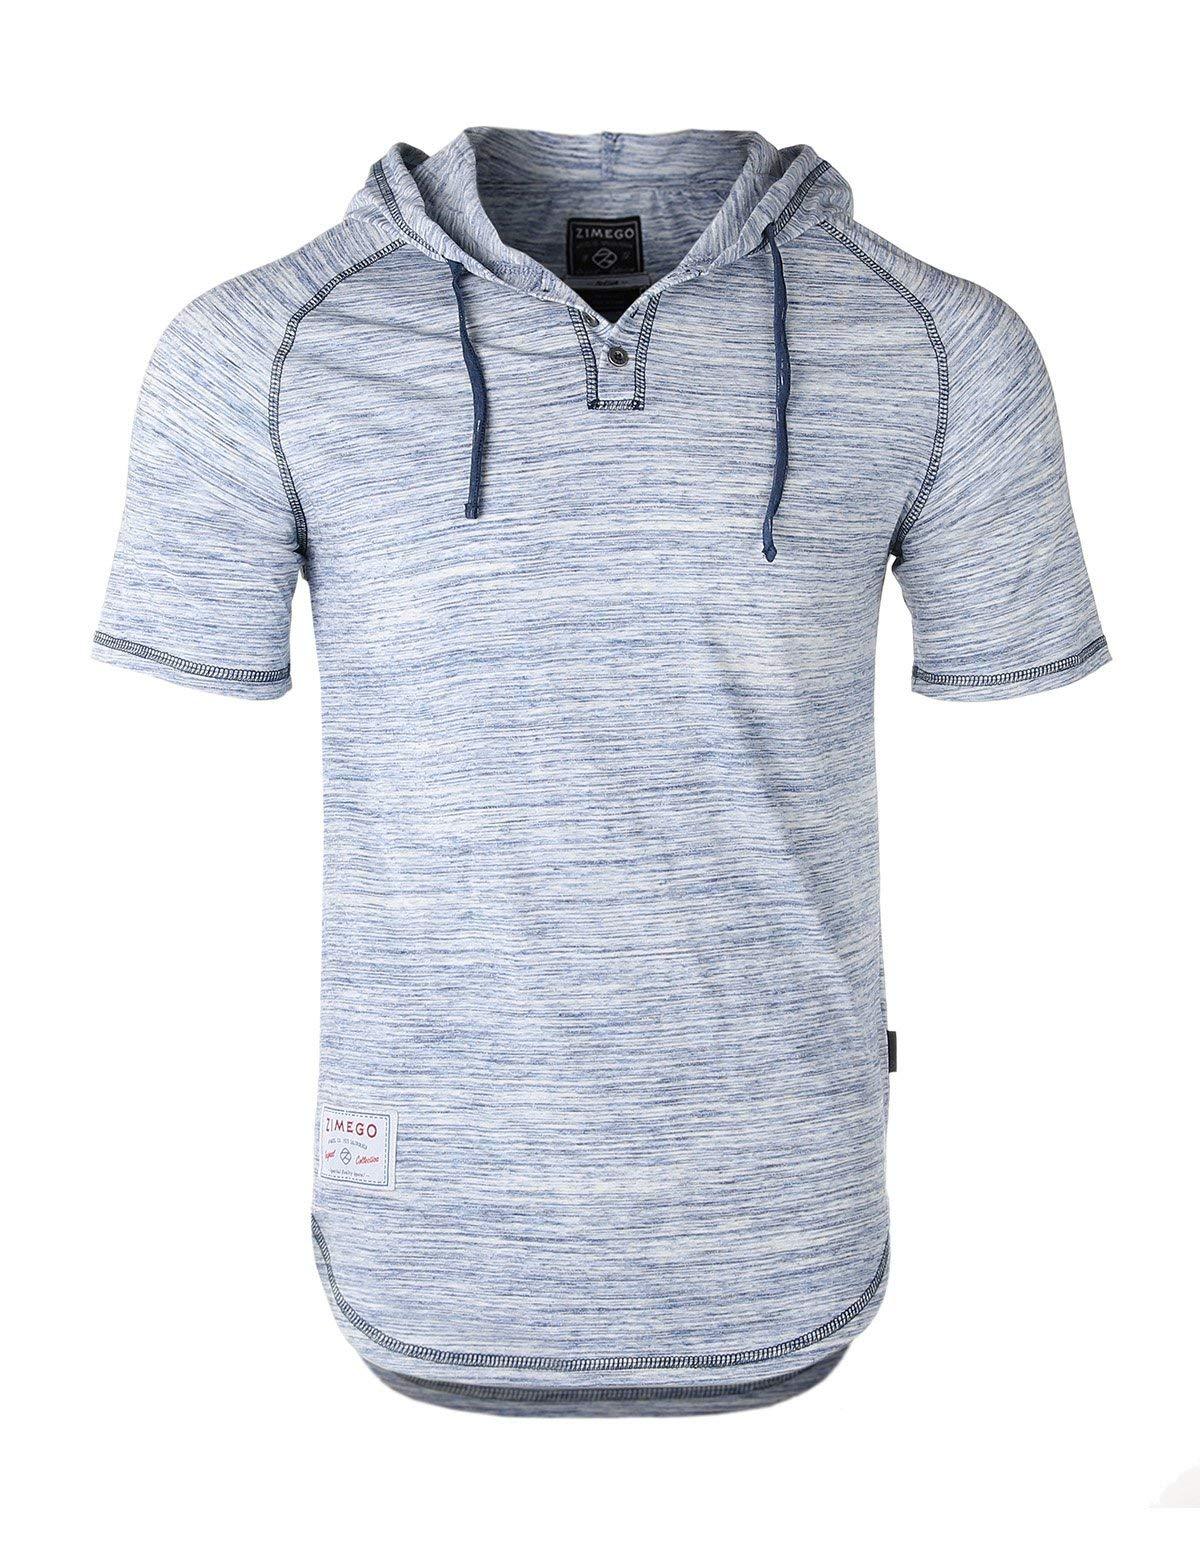 ZIMEGO Men's Color Block Short Sleeve Casual Fashion Hip Hop Hooded Henley Shirt